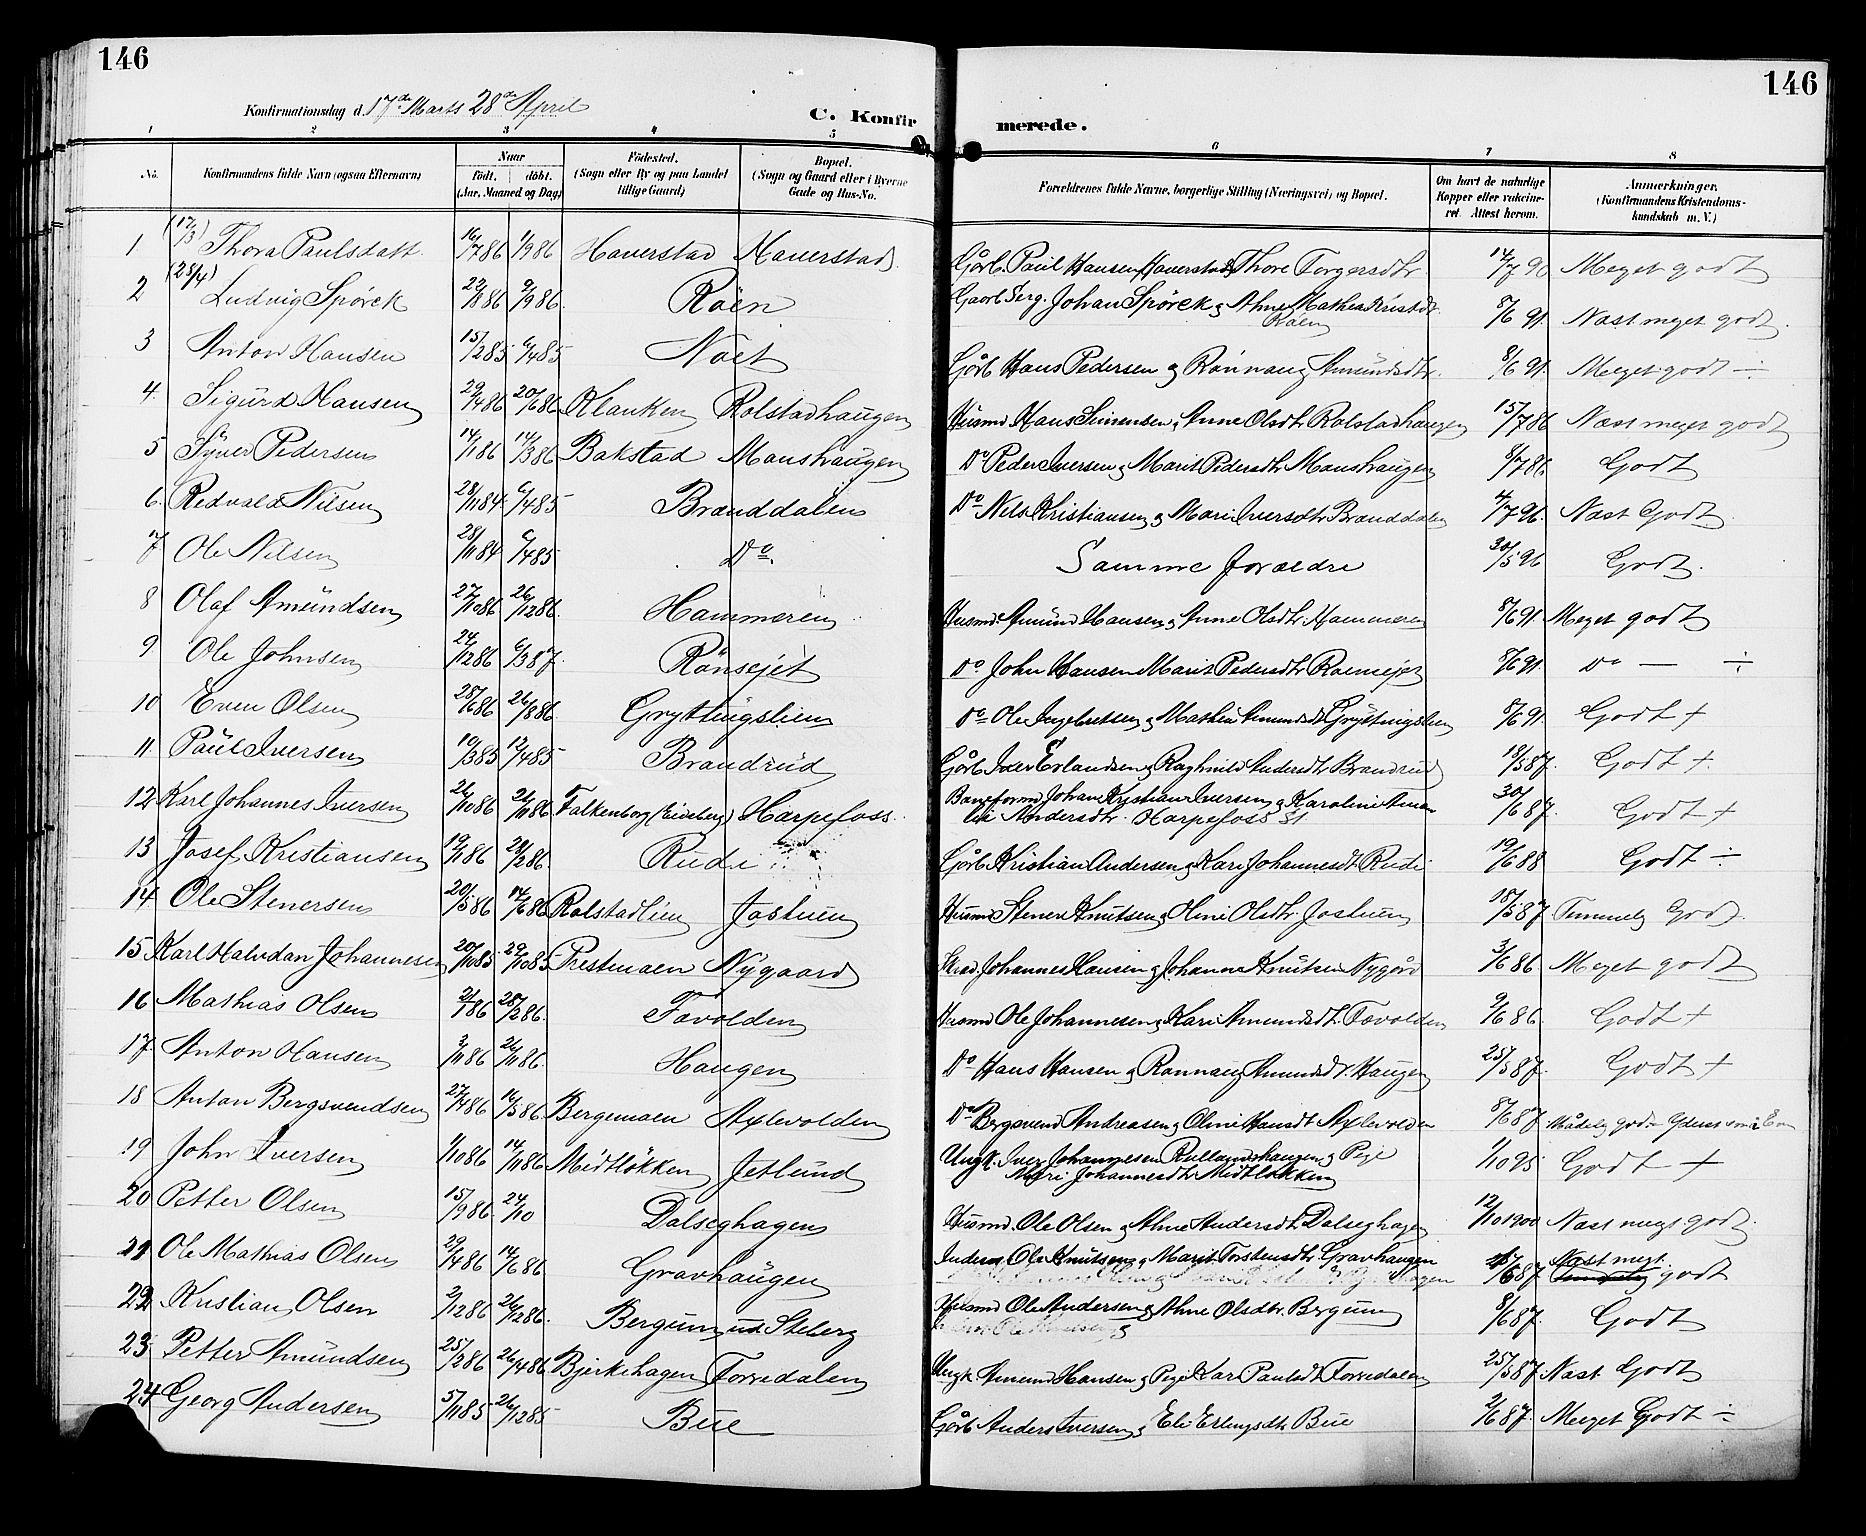 SAH, Sør-Fron prestekontor, H/Ha/Hab/L0004: Klokkerbok nr. 4, 1896-1911, s. 146